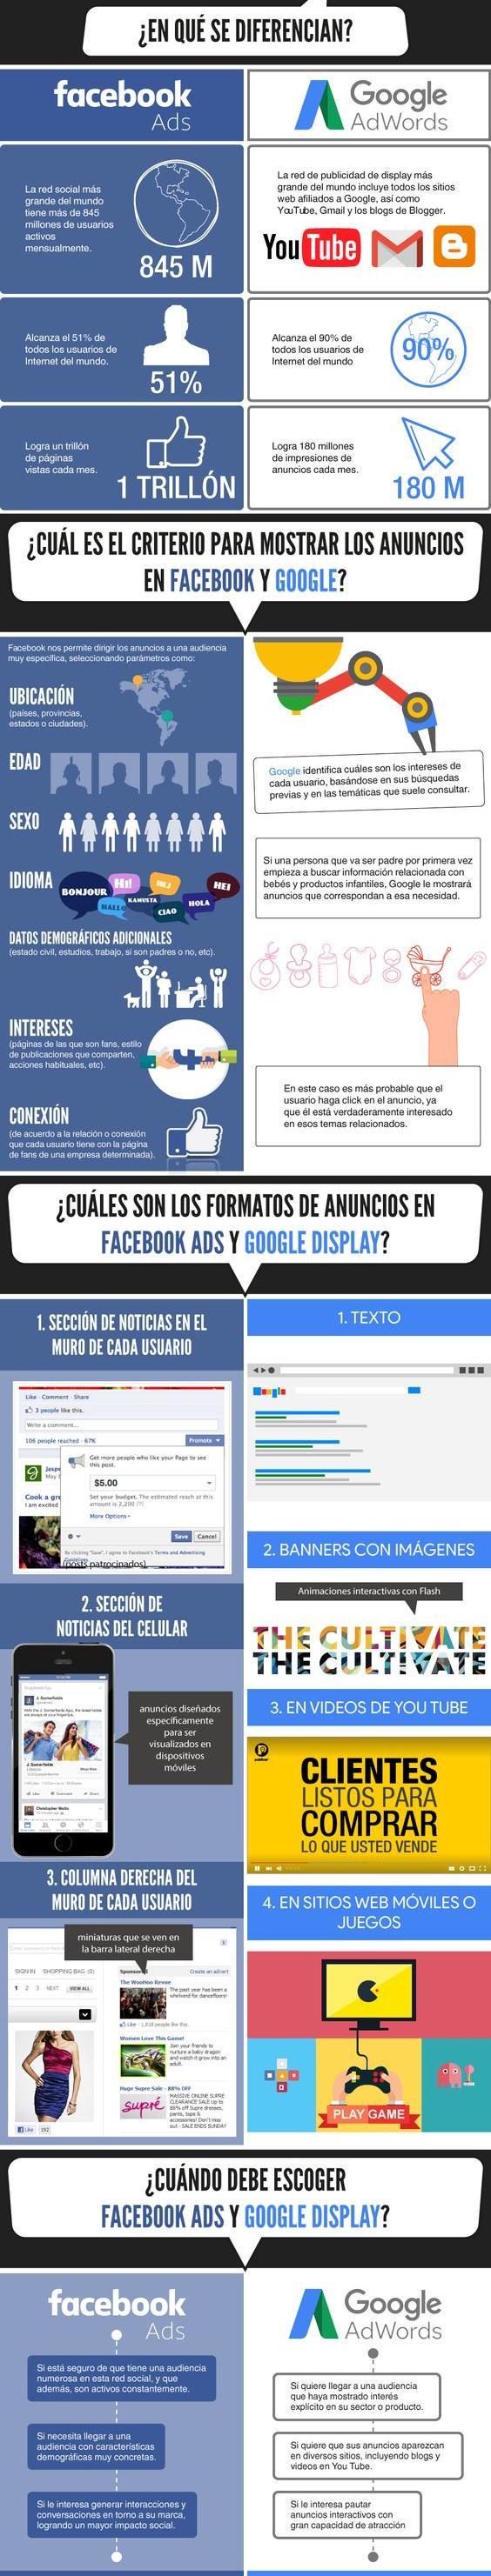 facebook-ads-vs-google-adwords-infografia